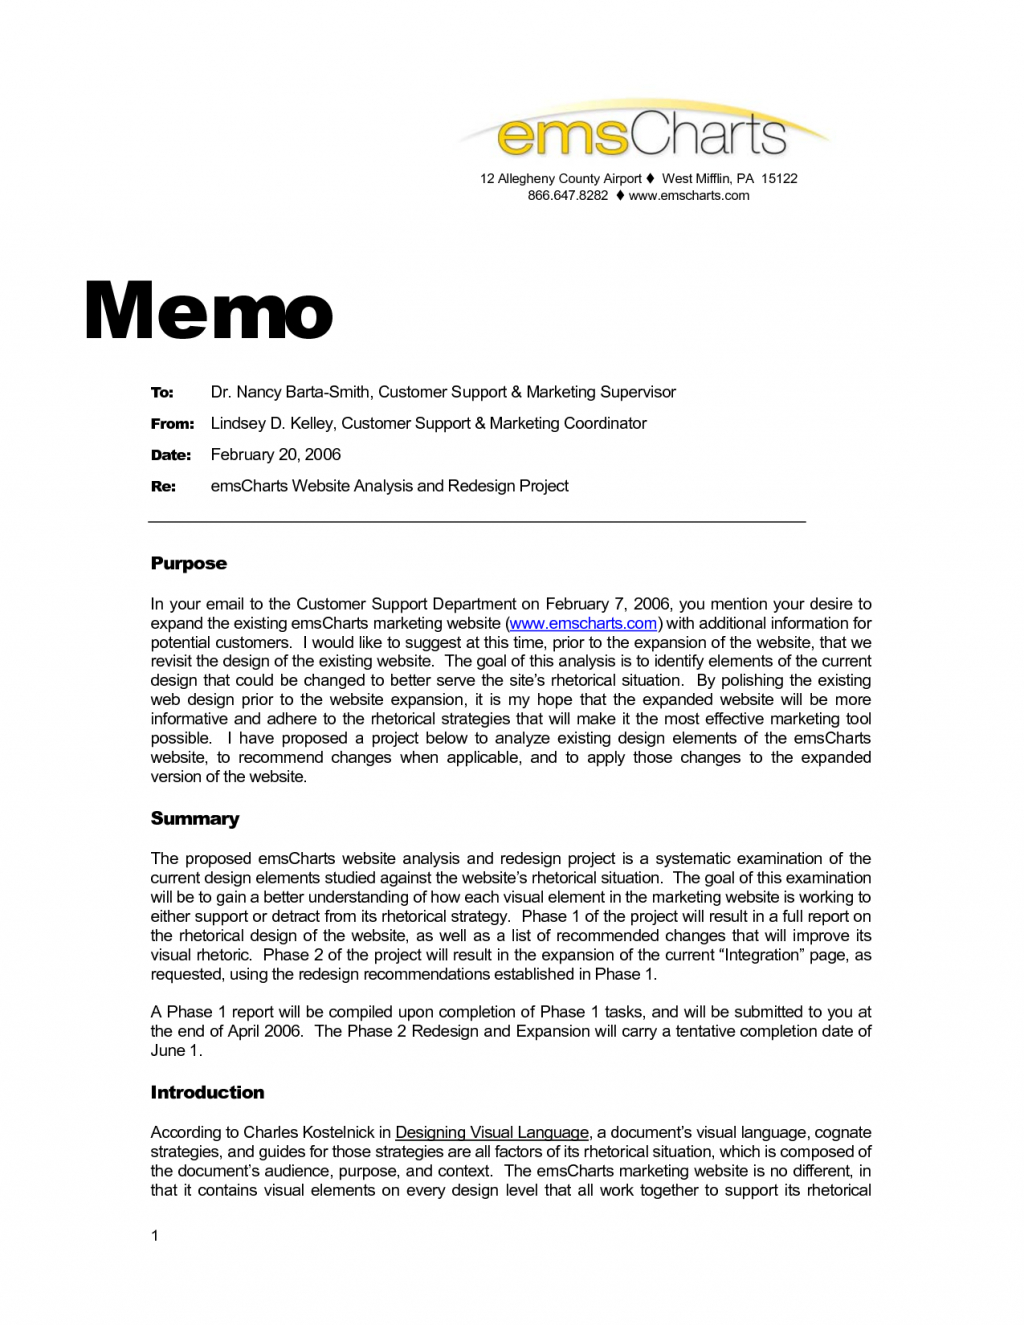 Internal Project Proposal Examples Format Business Memo Goal Regarding Internal Business Proposal Template